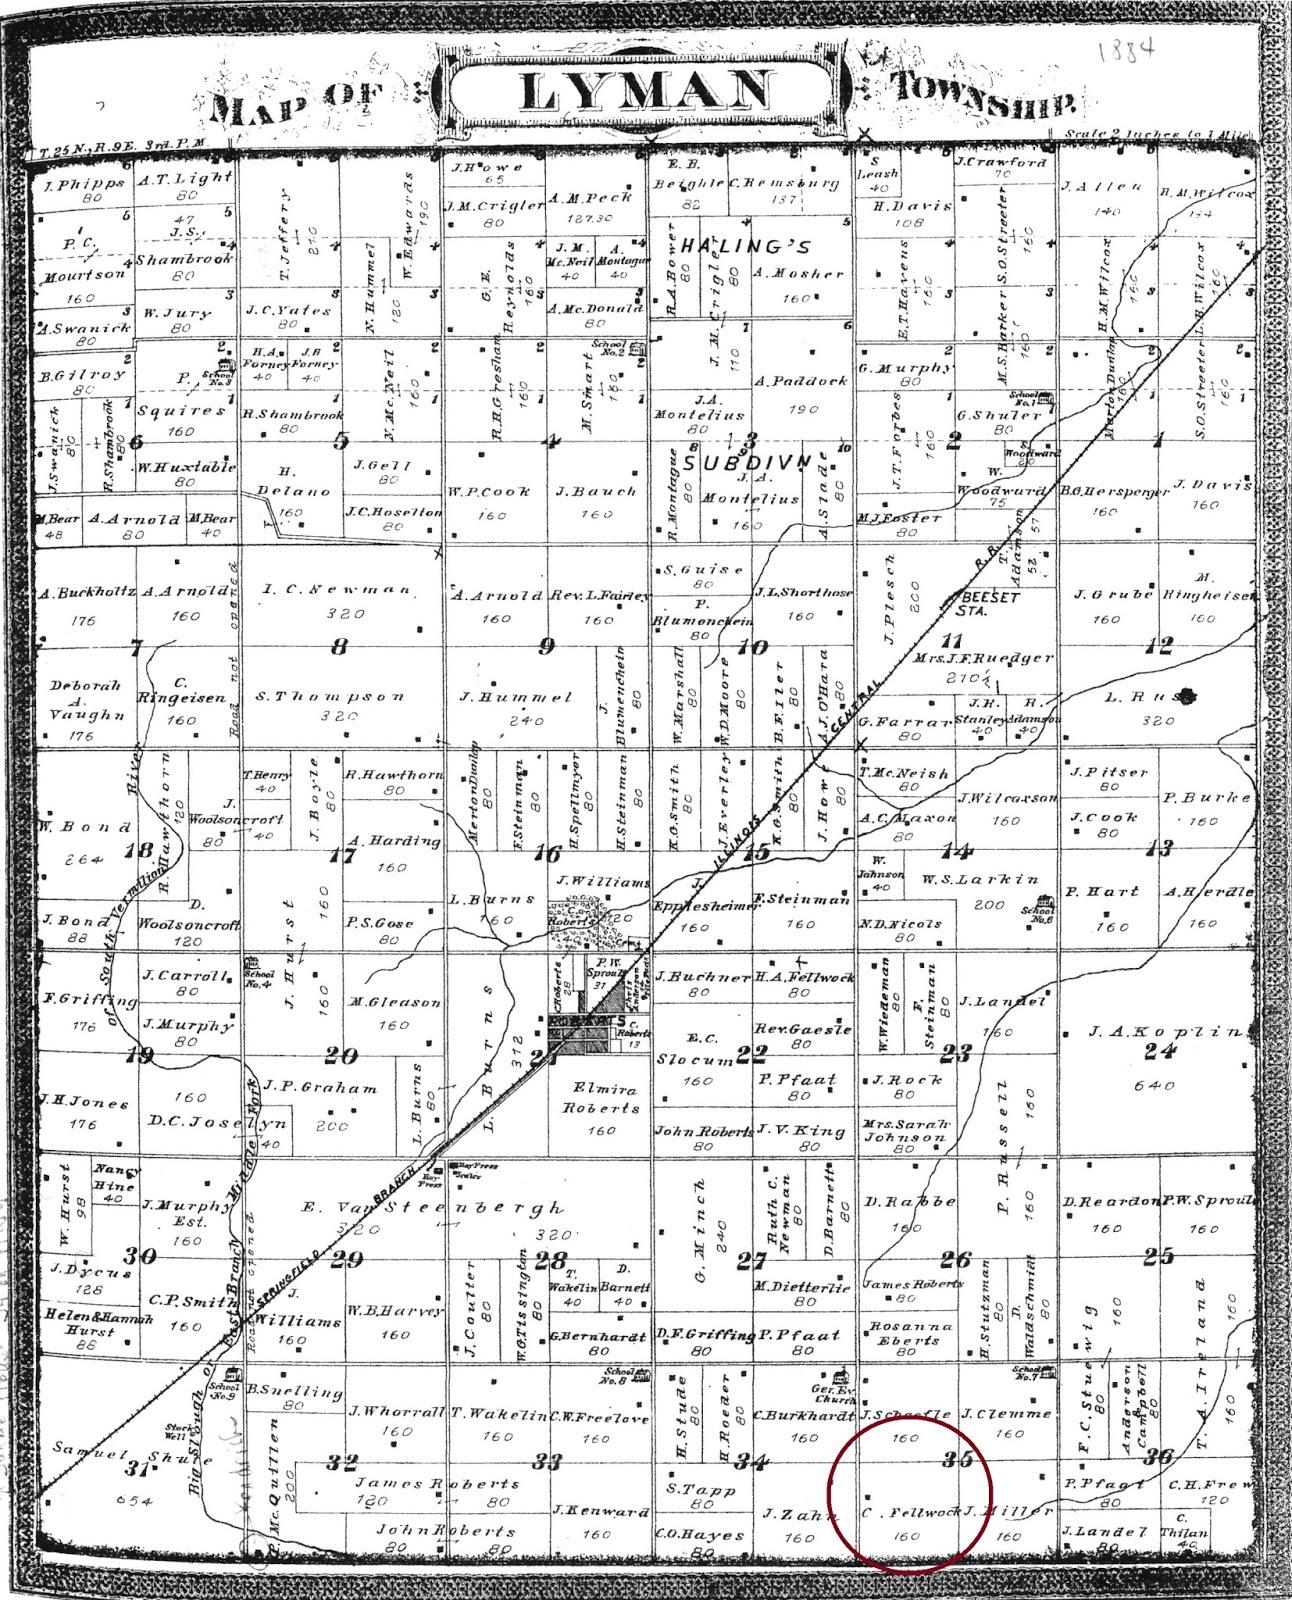 Roberts Illinois History: Charles C. Fellwock